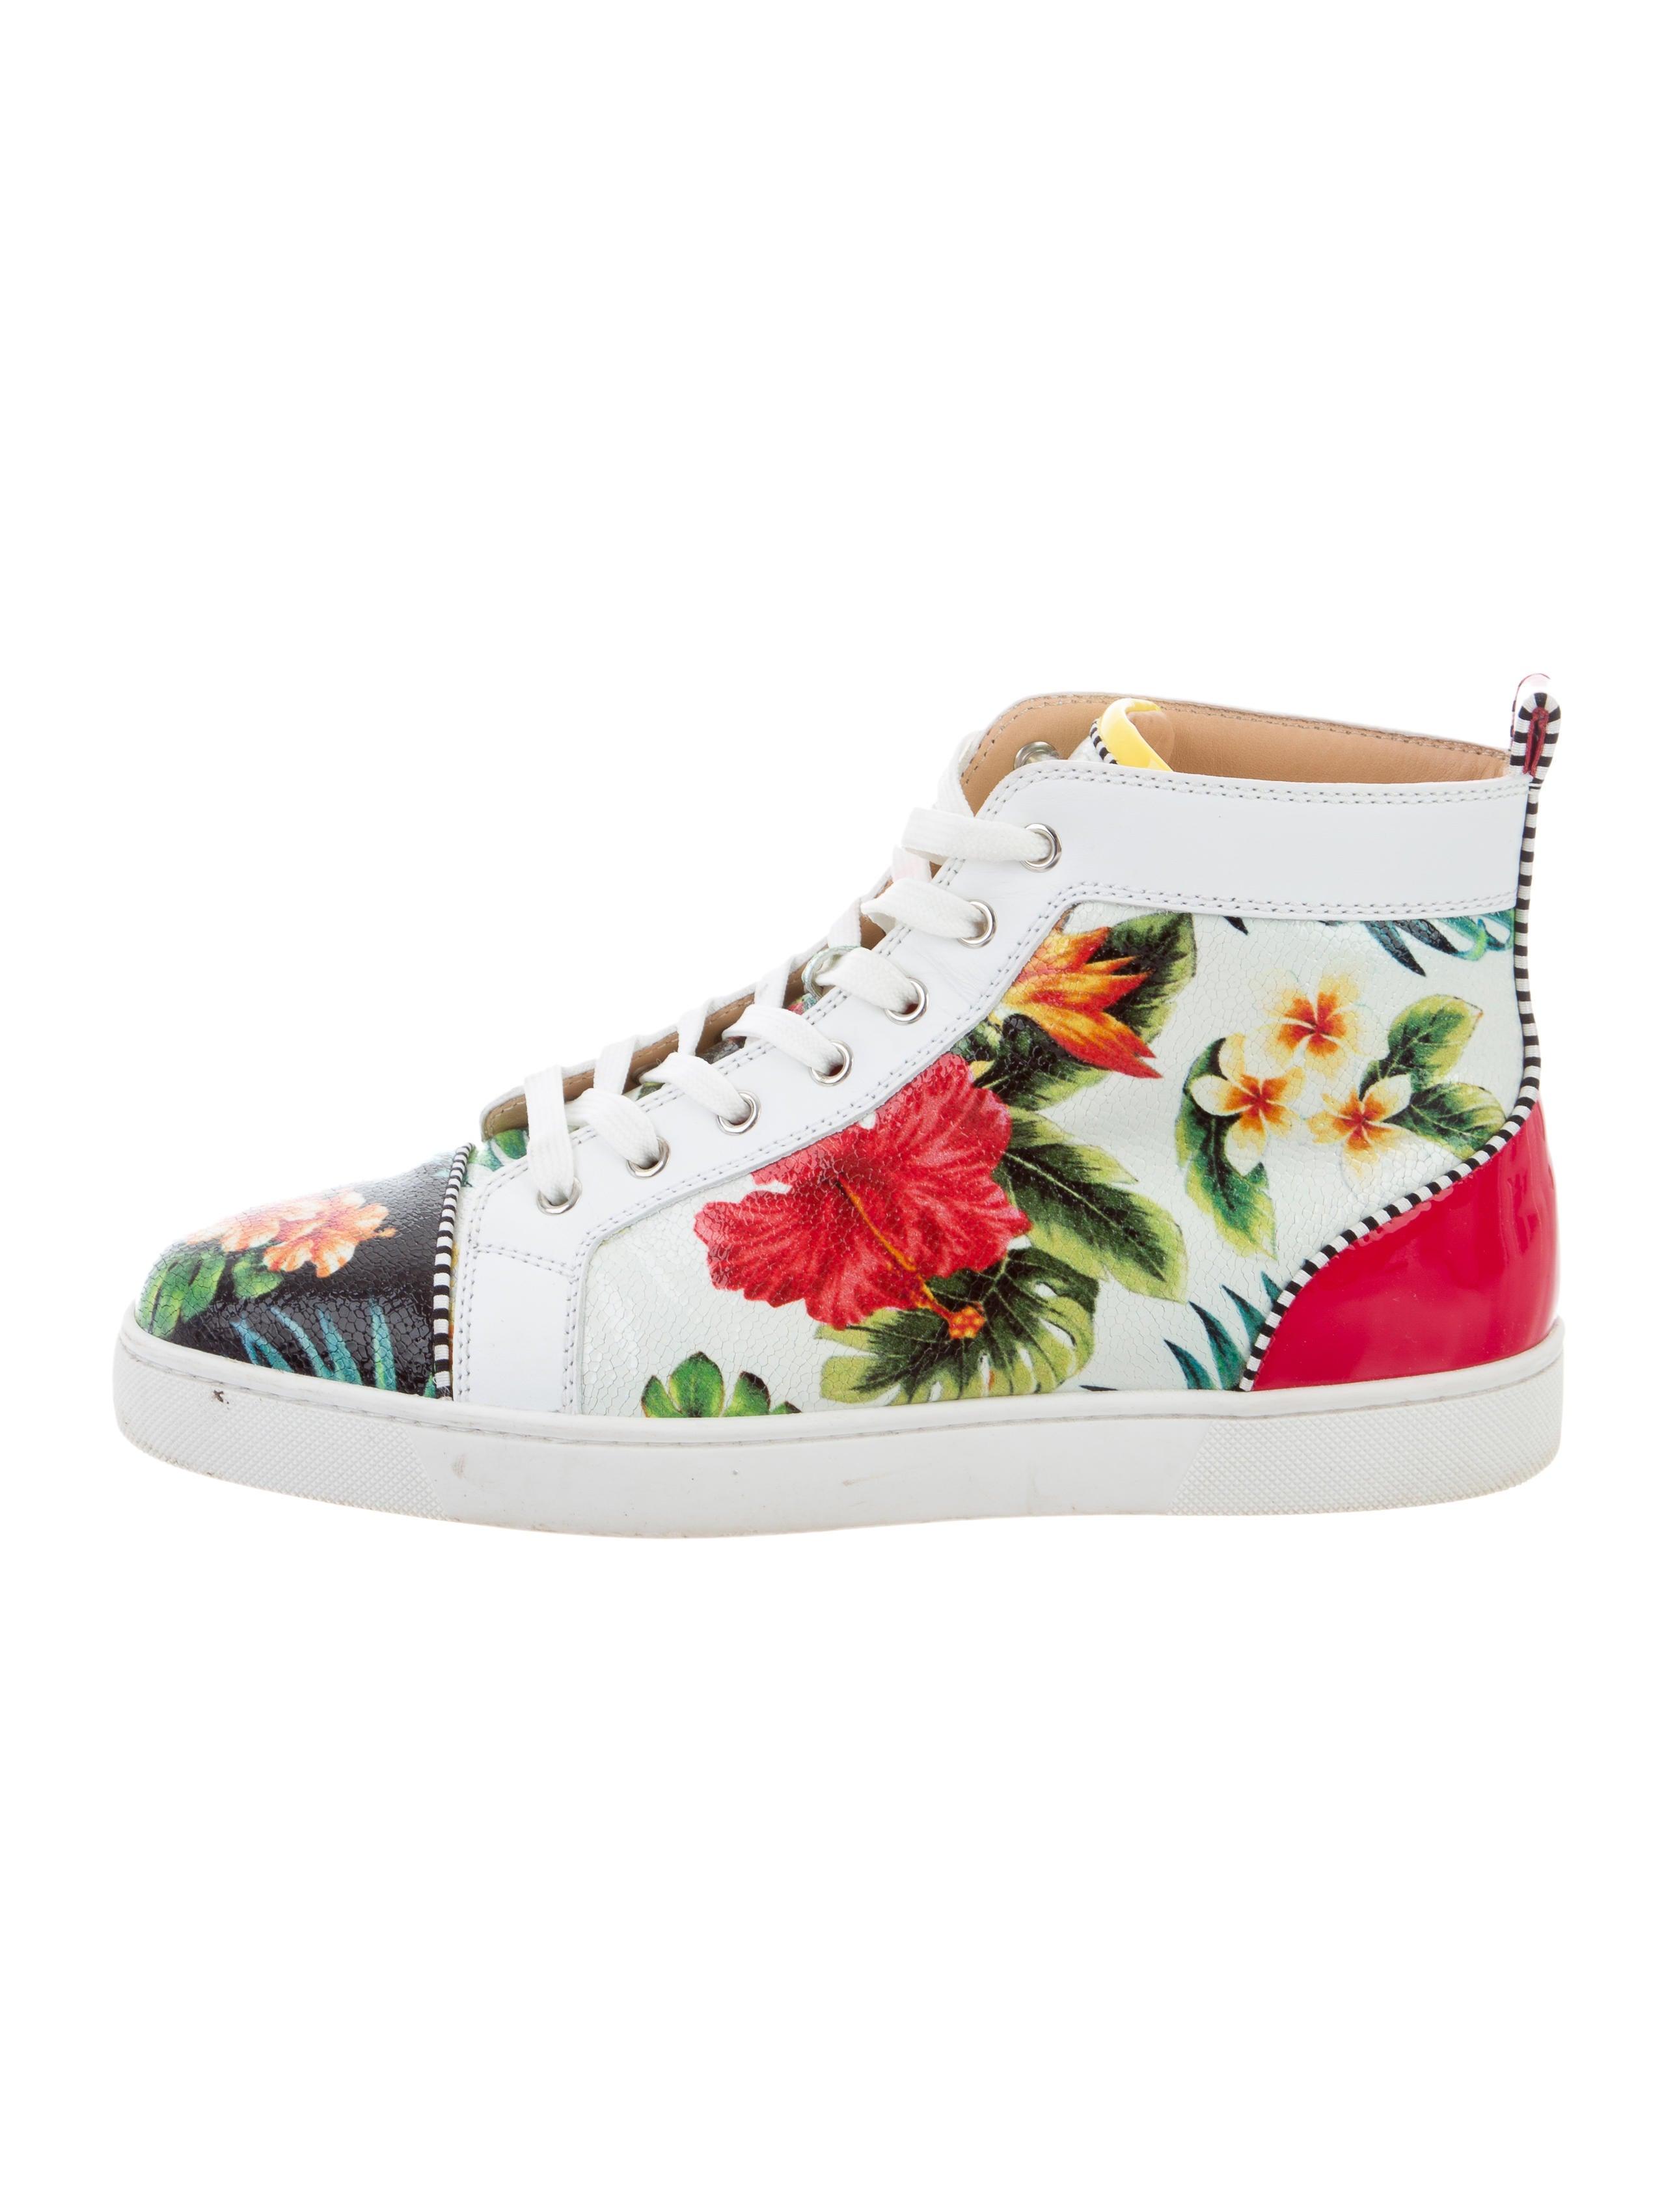 christian louboutin seava hawaii high top sneakers shoes rh therealreal com